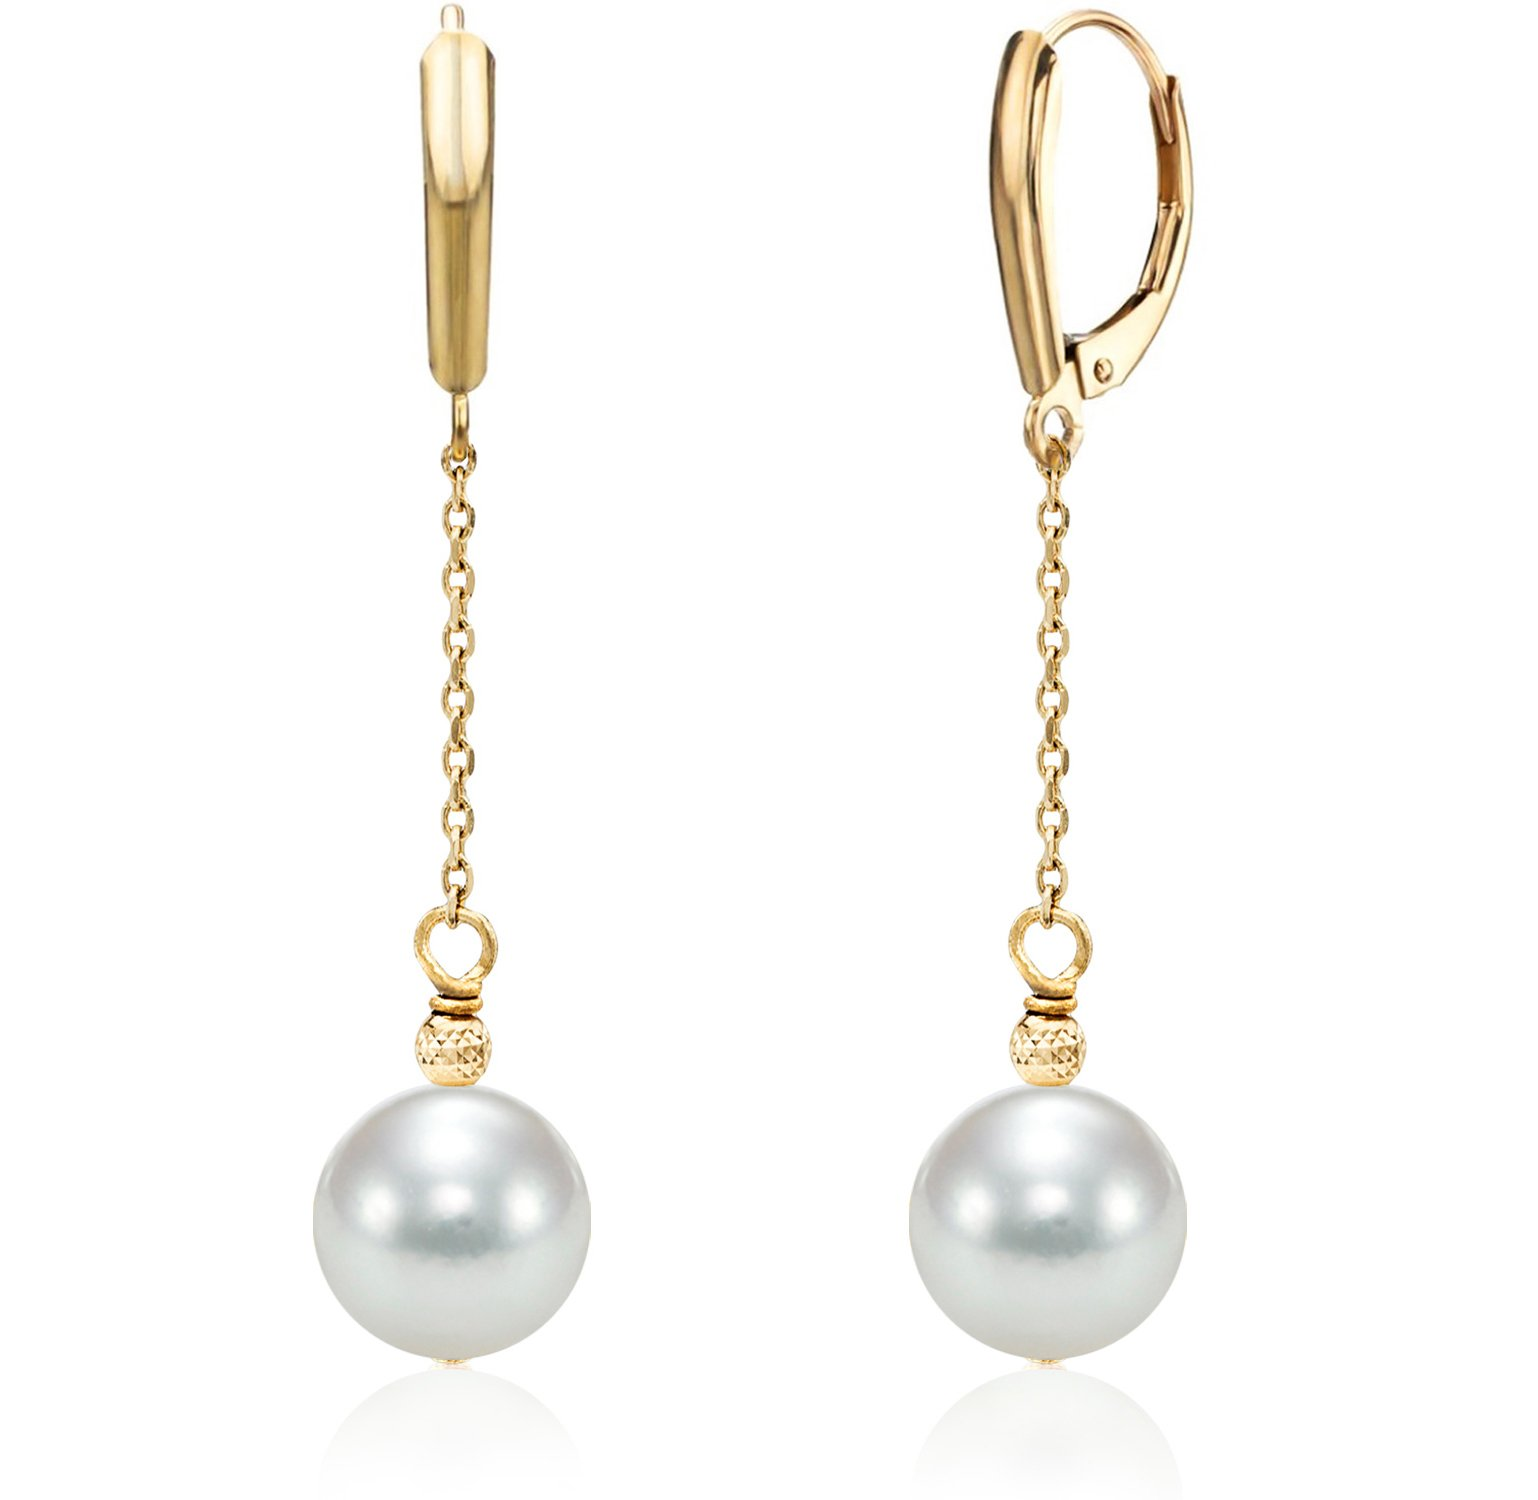 14K Yellow Gold Chain White Japanese Akoya Cultured Pearl Leverback Dangle Earrings 8-8.5mm by La Regis Jewelry (Image #1)